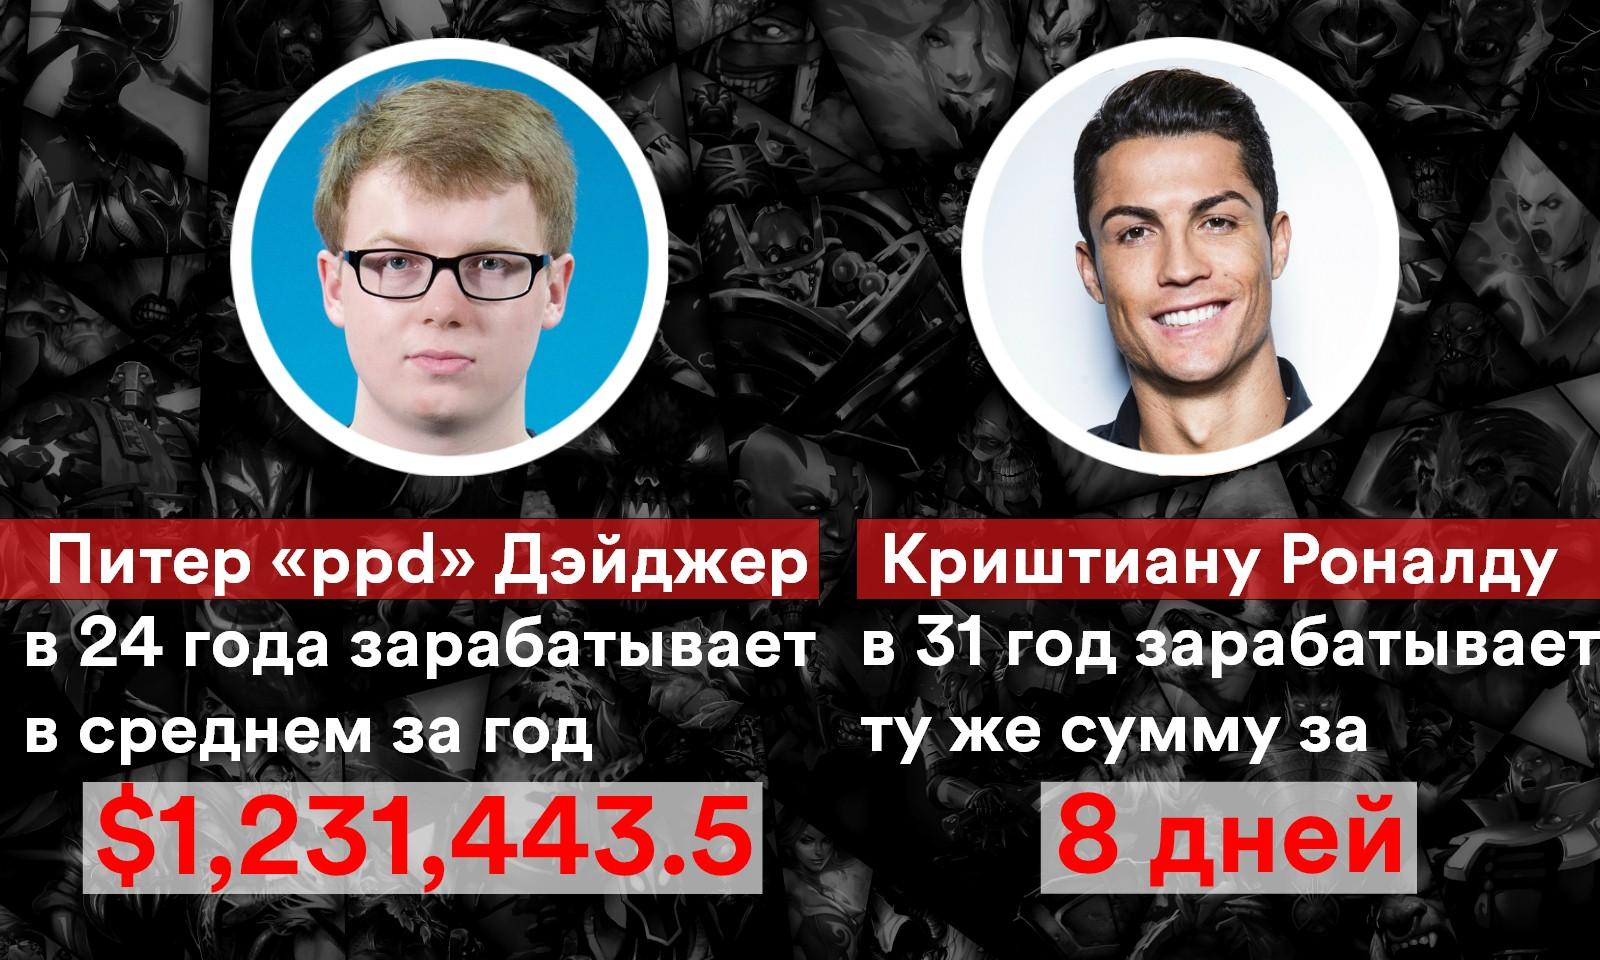 https://i.eurosport.com/2016/03/25/1822868.jpg